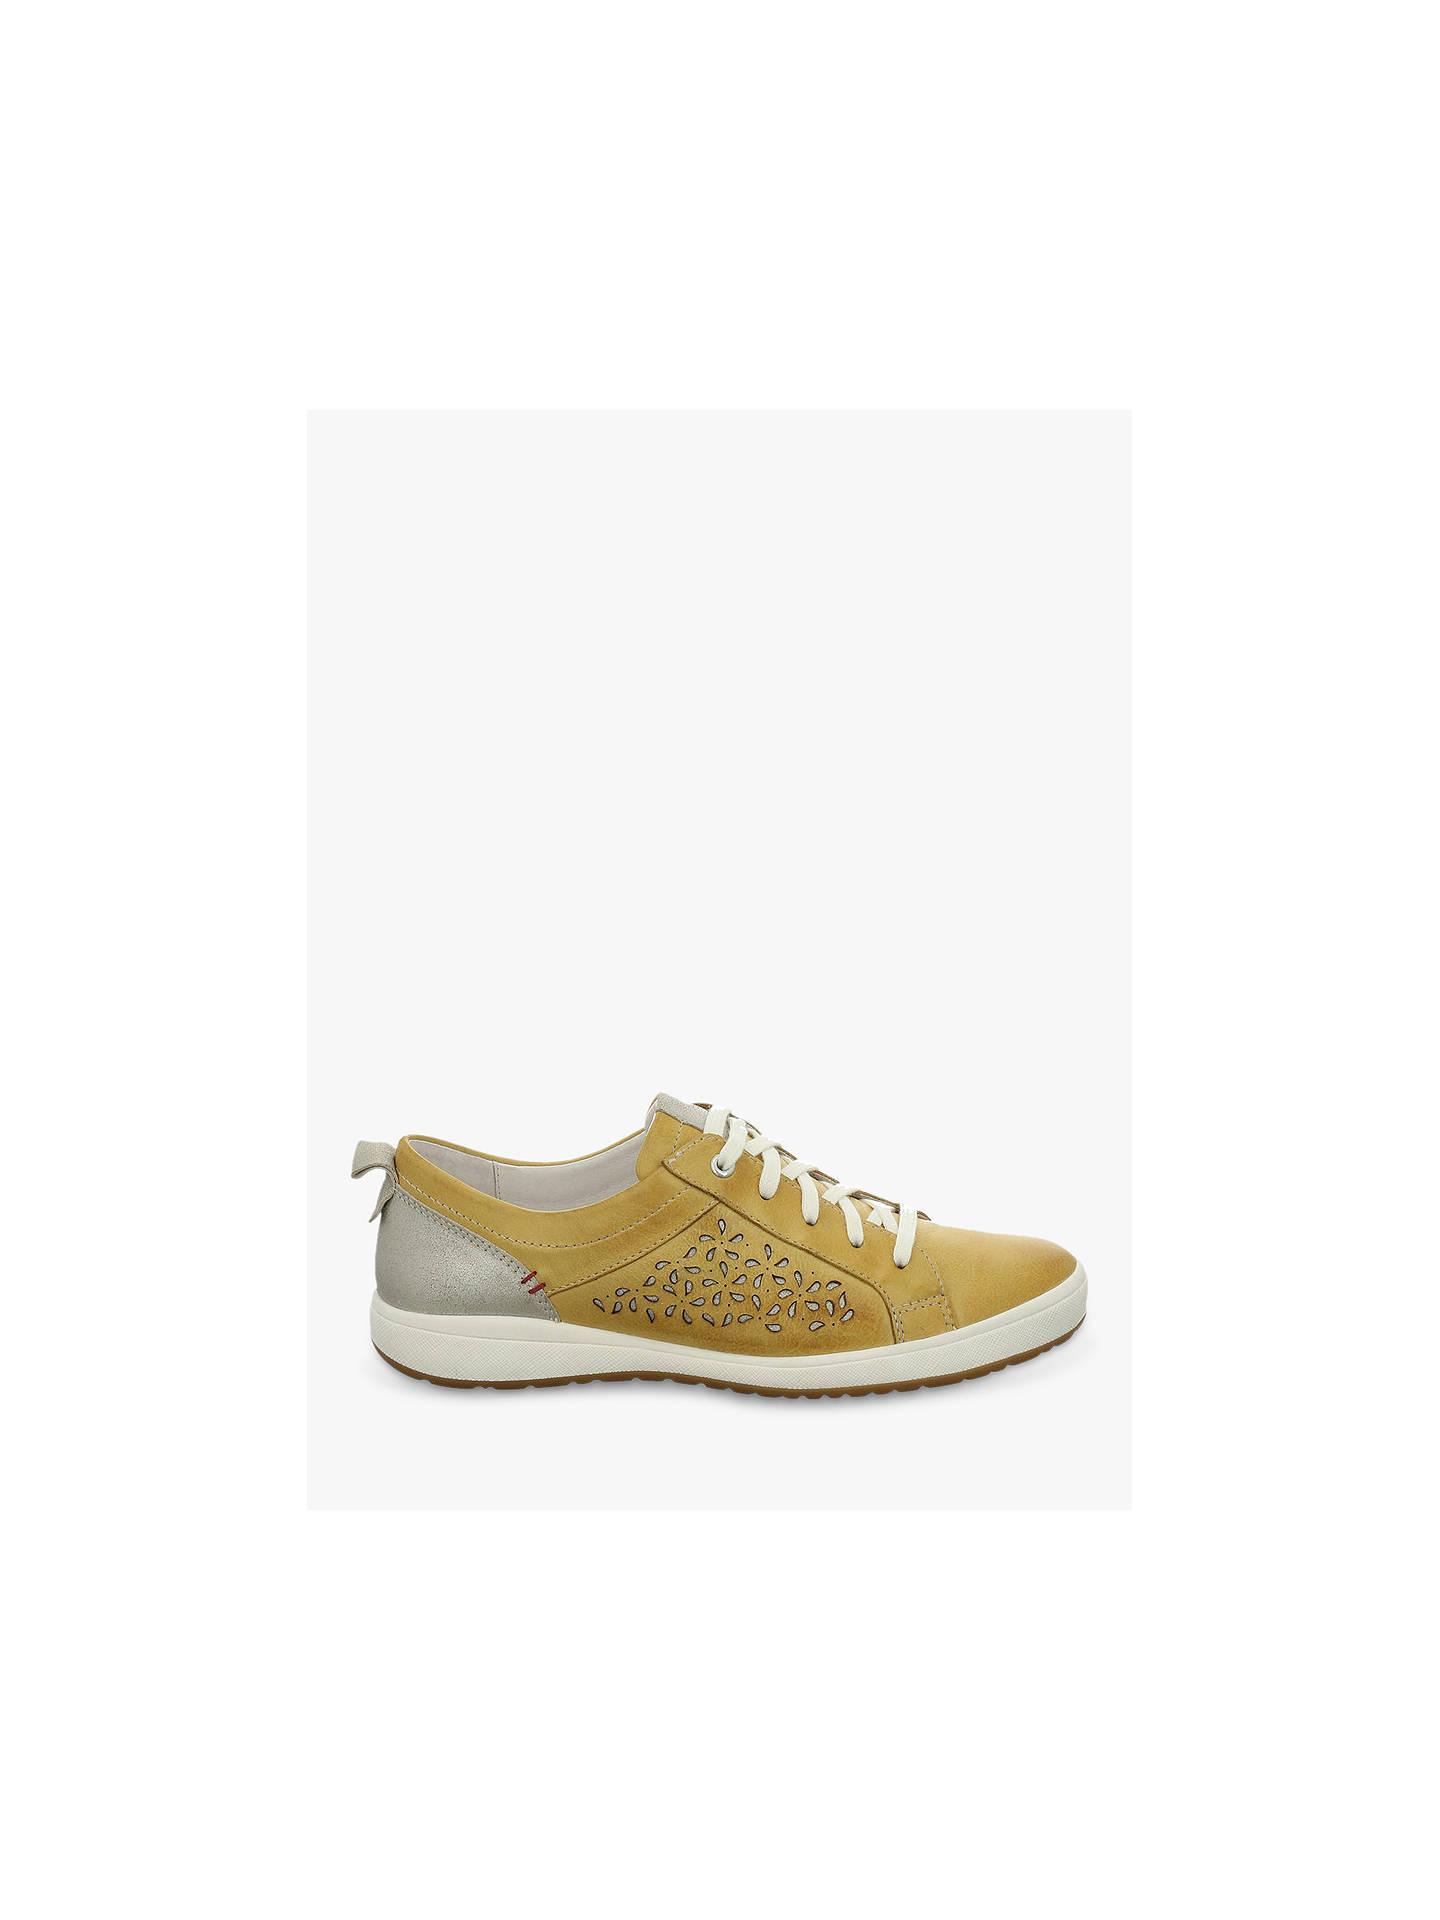 24a7c0ef ... Buy Josef Seibel Caren 06 Low Top Cut Out Flatform Trainers, Mustard  Leather, 4 ...